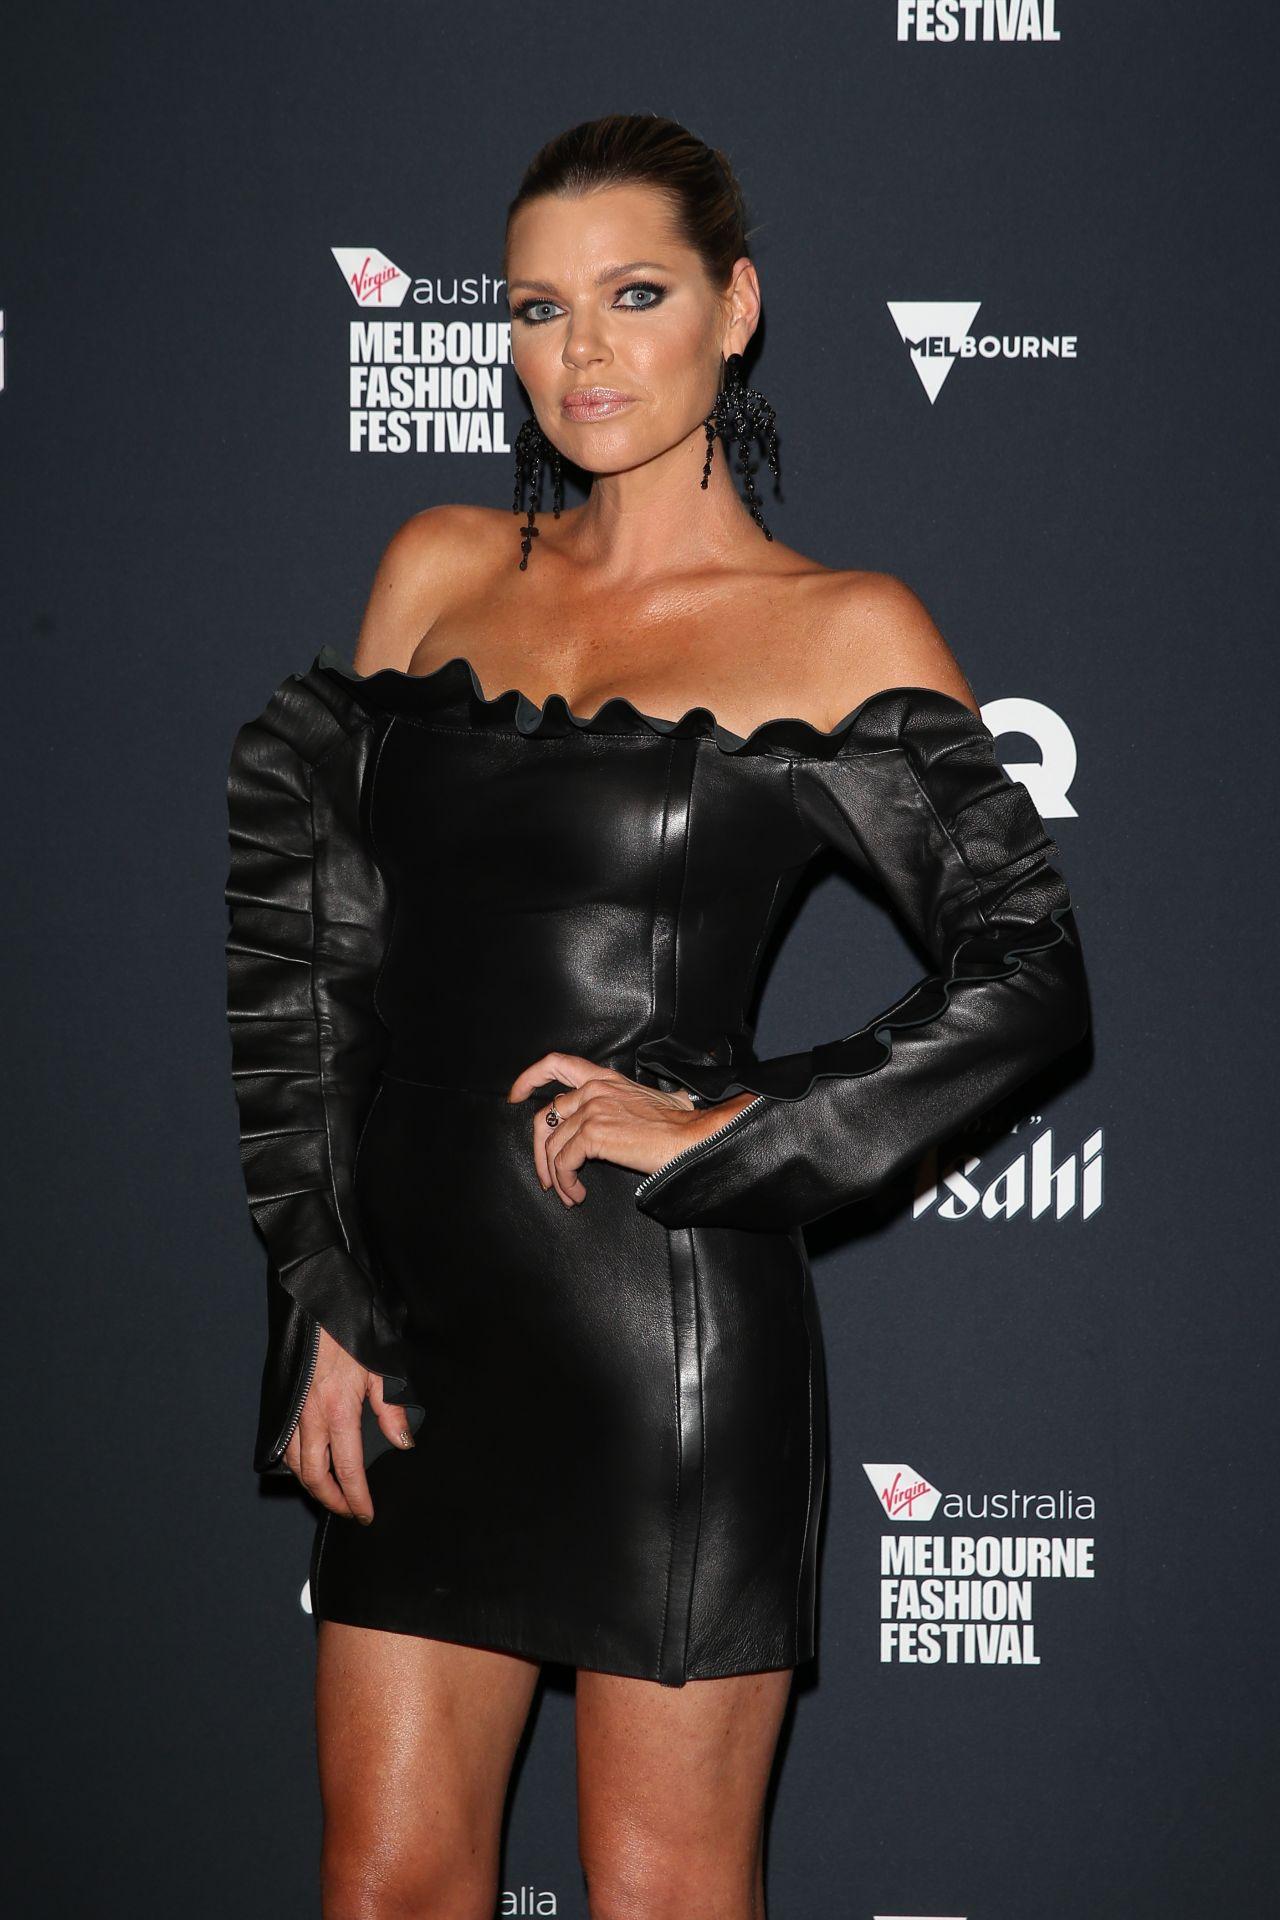 Sophie Monk Gq Mens Fashion At The Virgin Australia